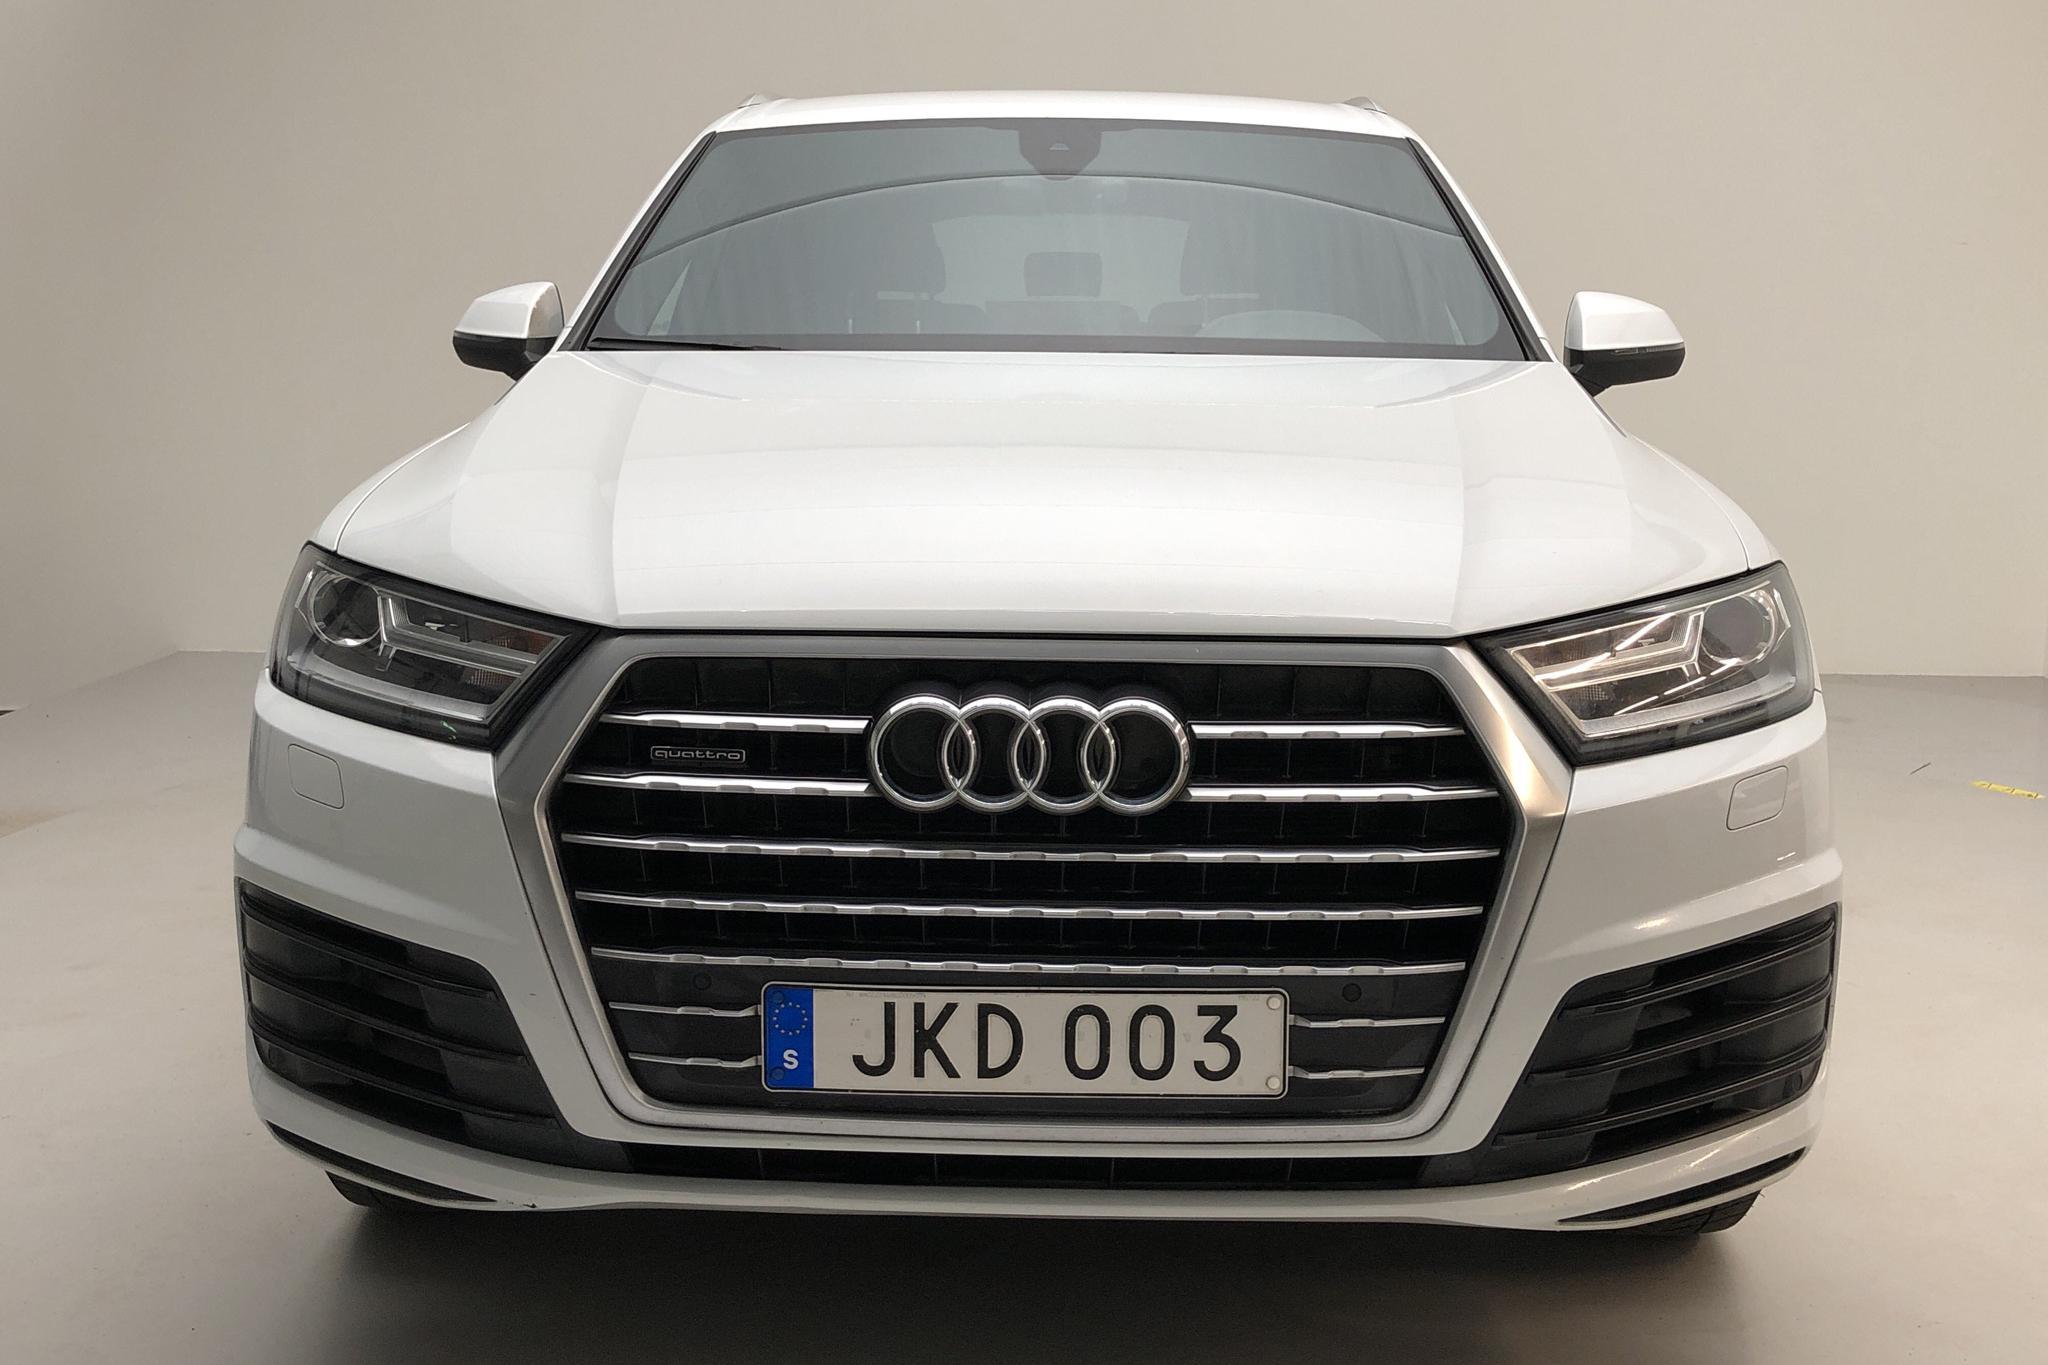 Audi Q7 3.0 TDI quattro (272hk) - 99 120 km - Automatic - white - 2016